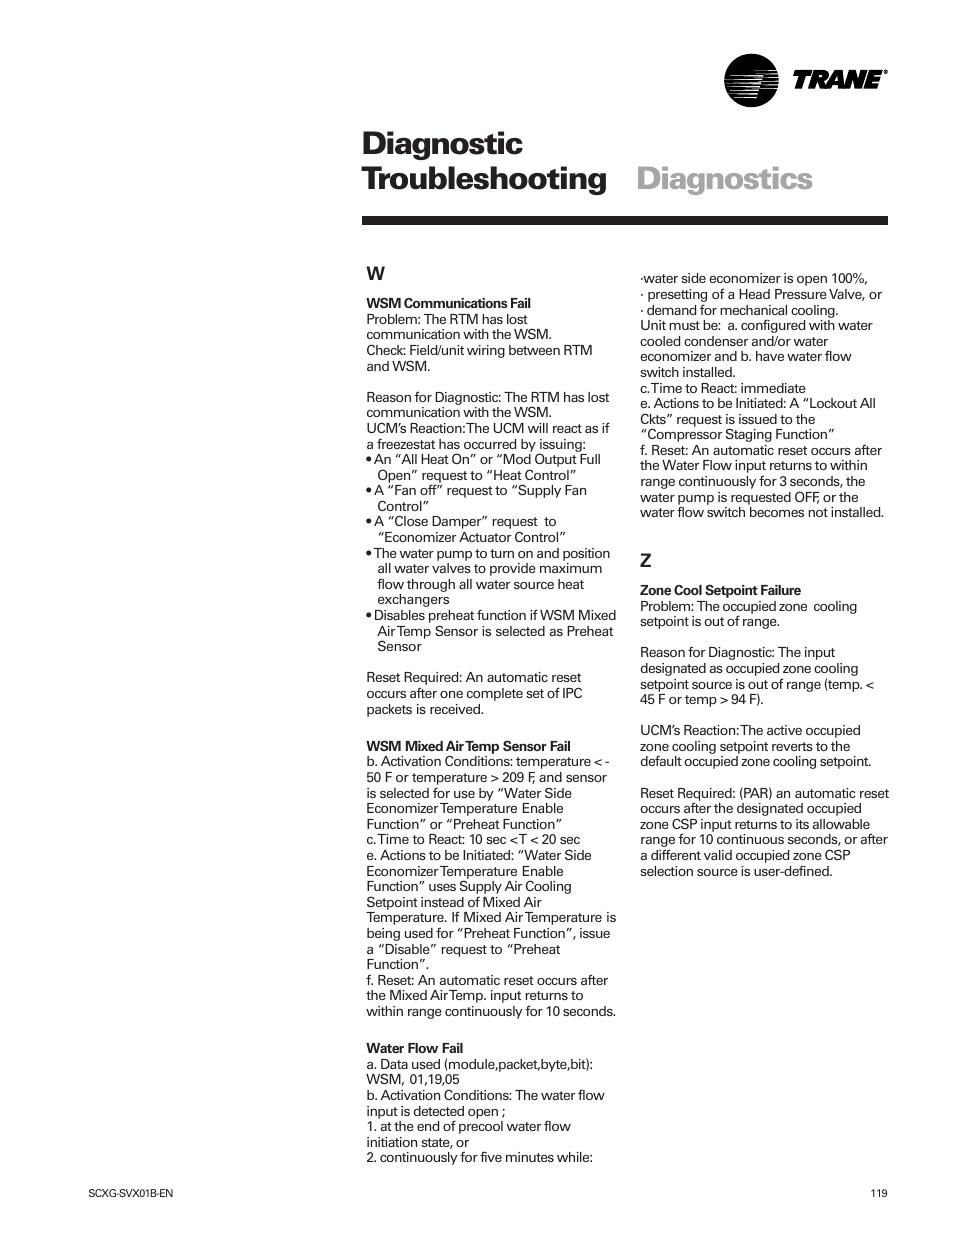 Diagnostic troubleshooting diagnostics | Trane IntelliPak SCWG 020 User  Manual | Page 119 / 124